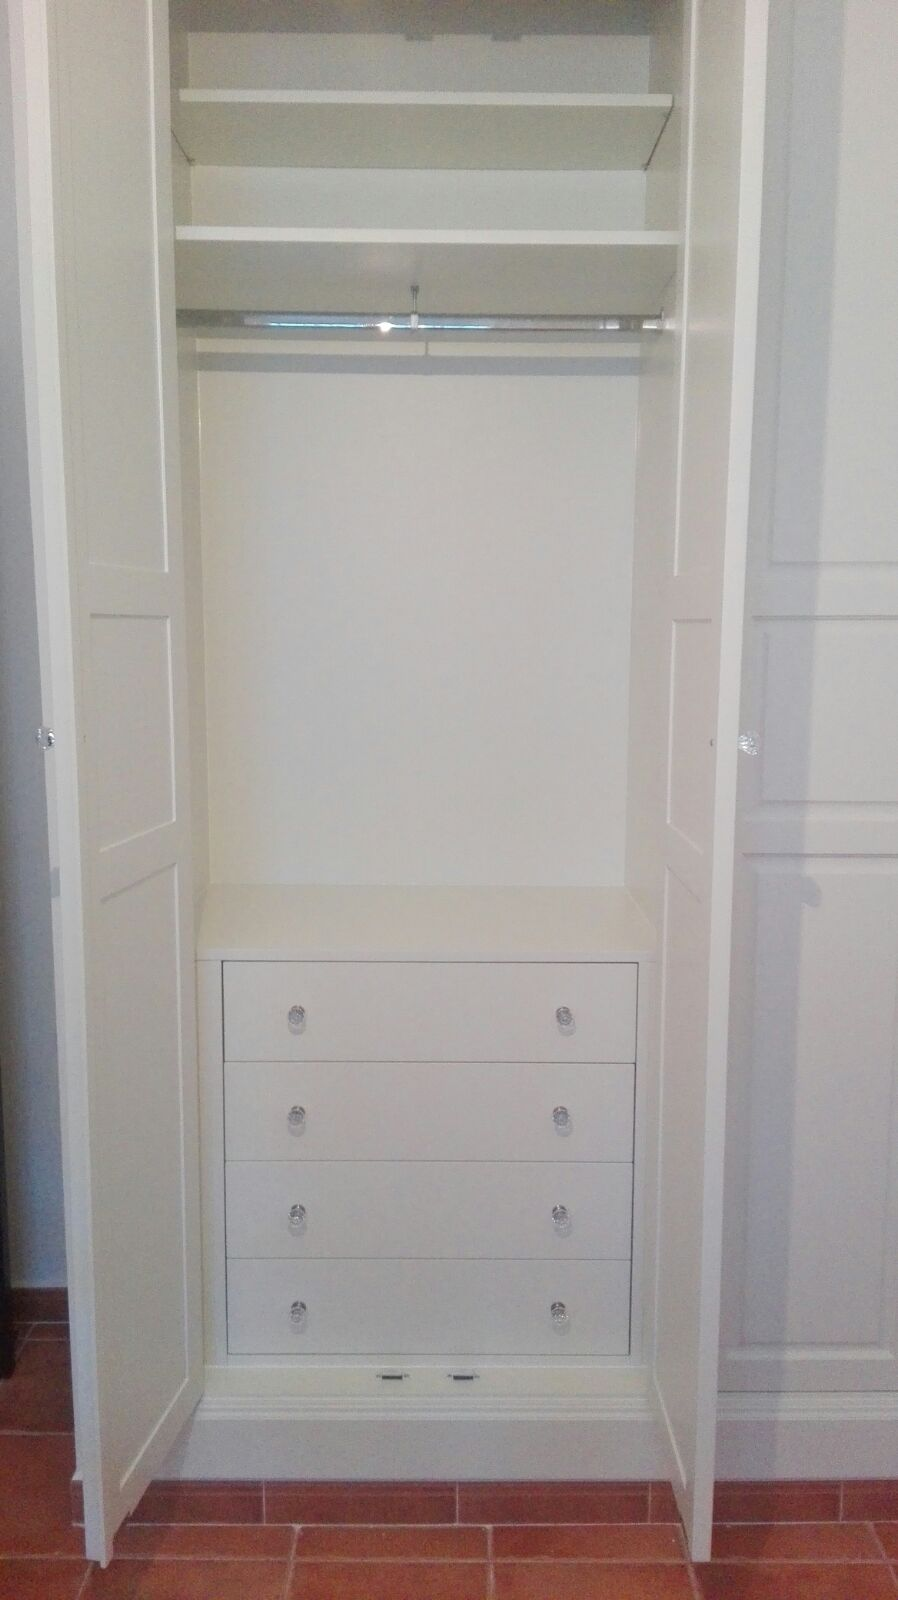 Habitación blanca con terciopelo